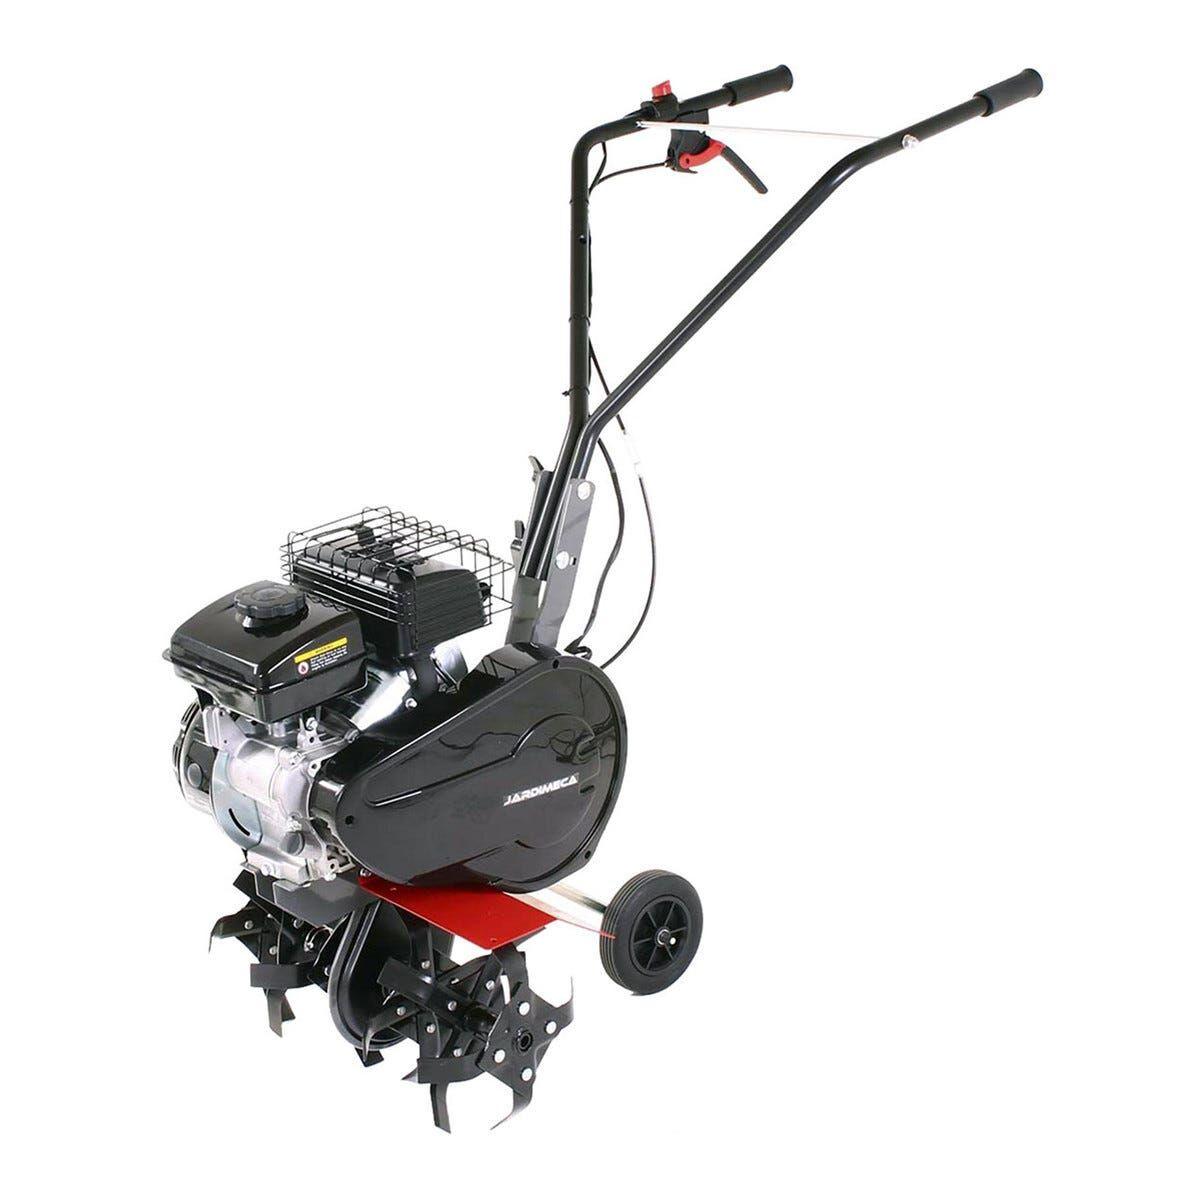 Cc Motozappa 79 Cc Jardimeca Fts100 Larghezza Lavoro 35 Cm Motore R80ohv Frese Ø 24 Cm